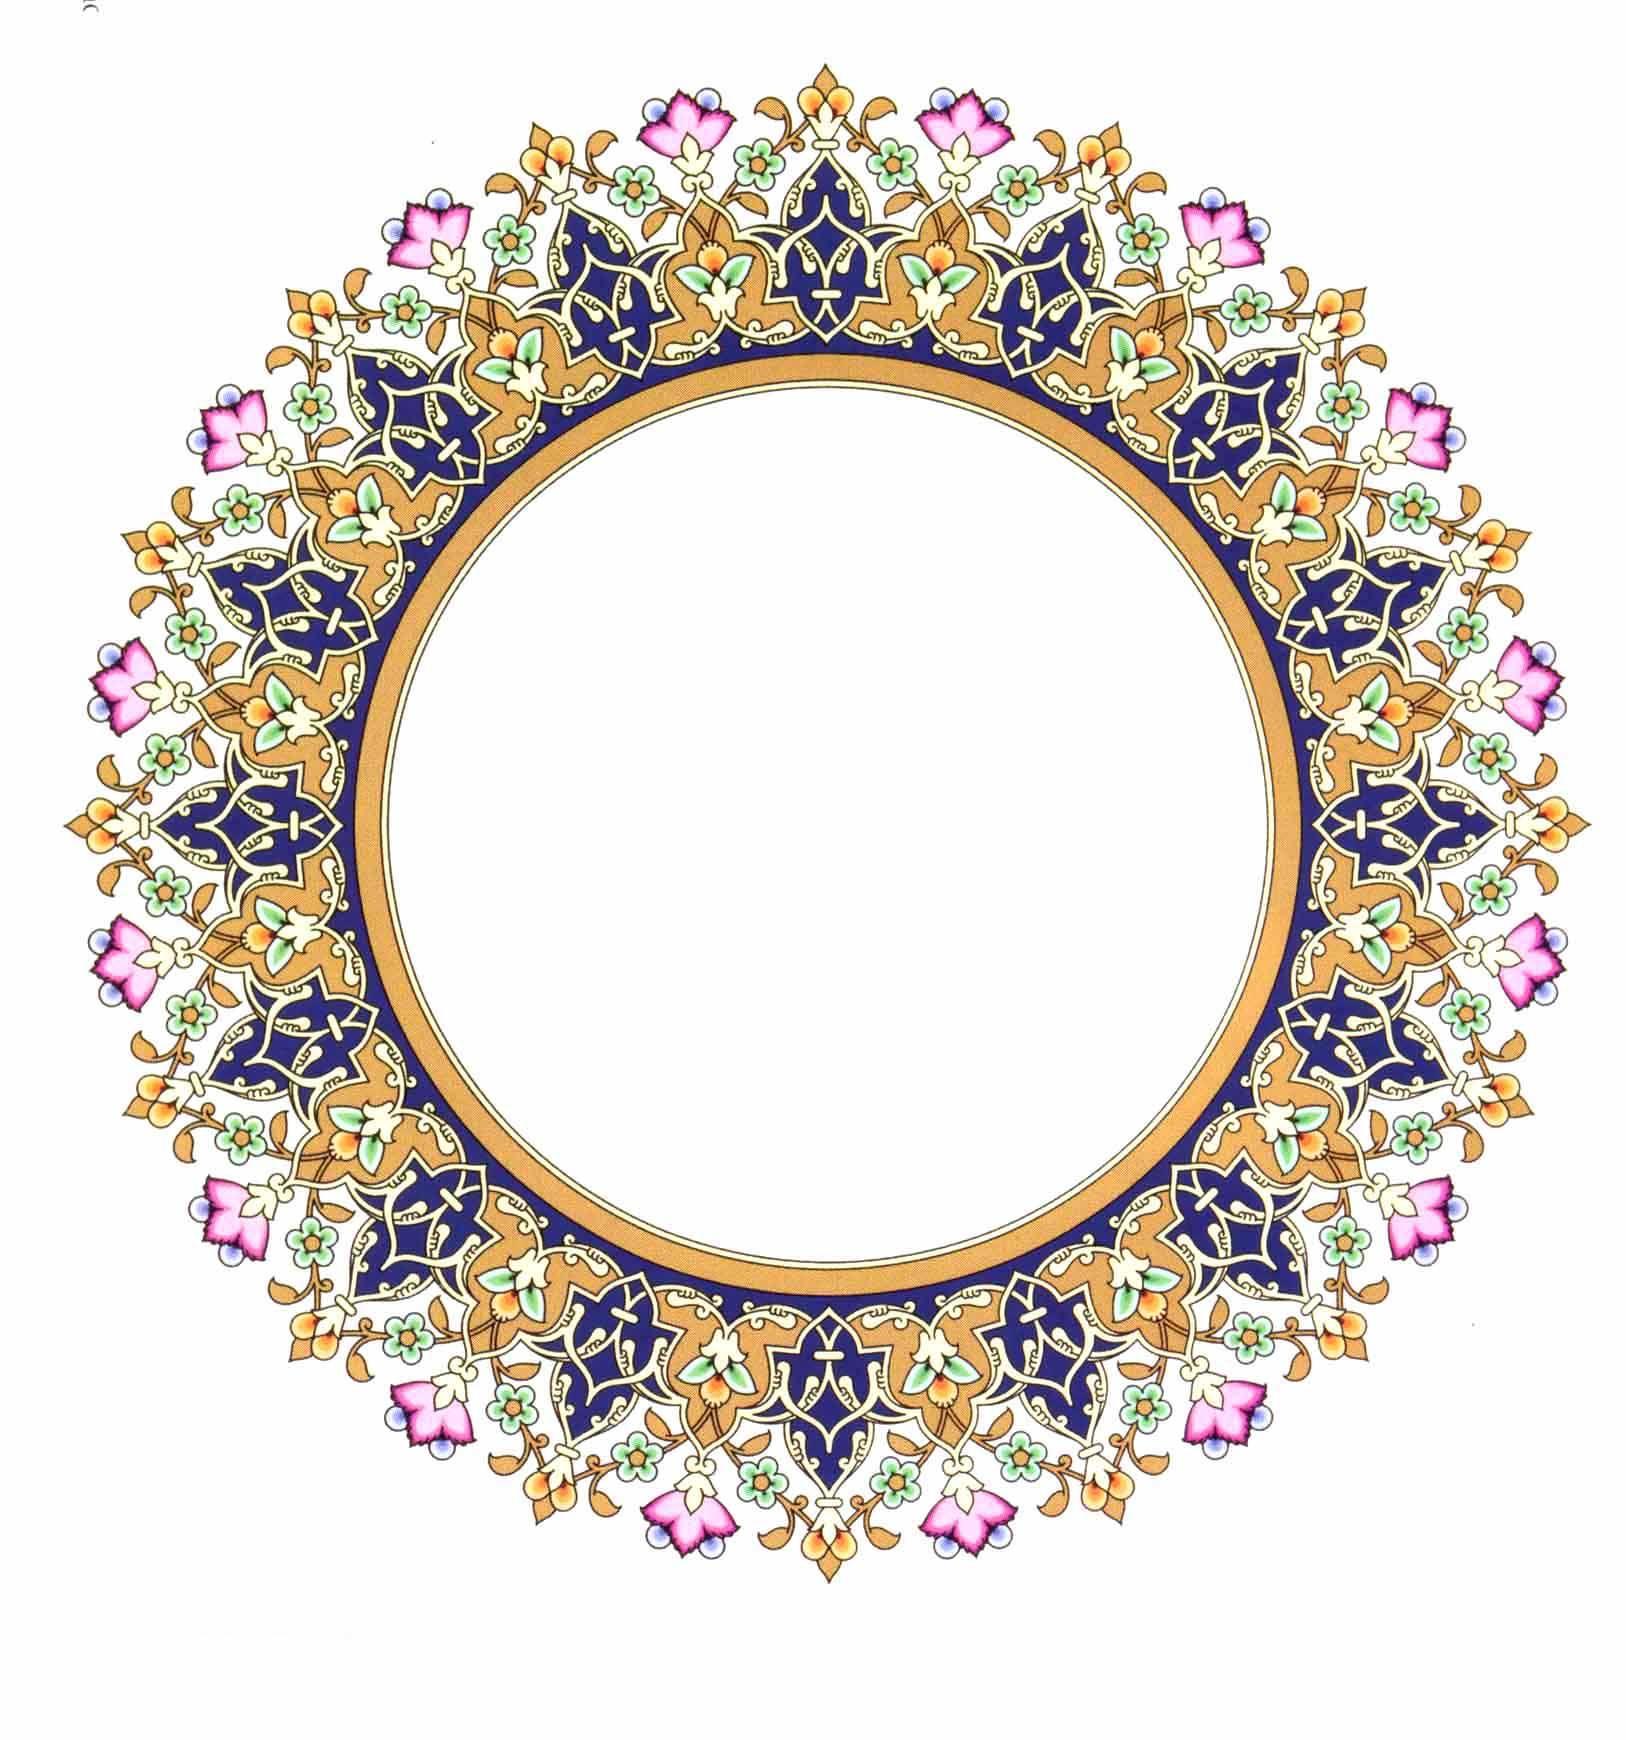 147528302506217497611147239231189244135 Jpg 1626 1740 Islamic Art Calligraphy Islamic Art Pattern Pattern Art